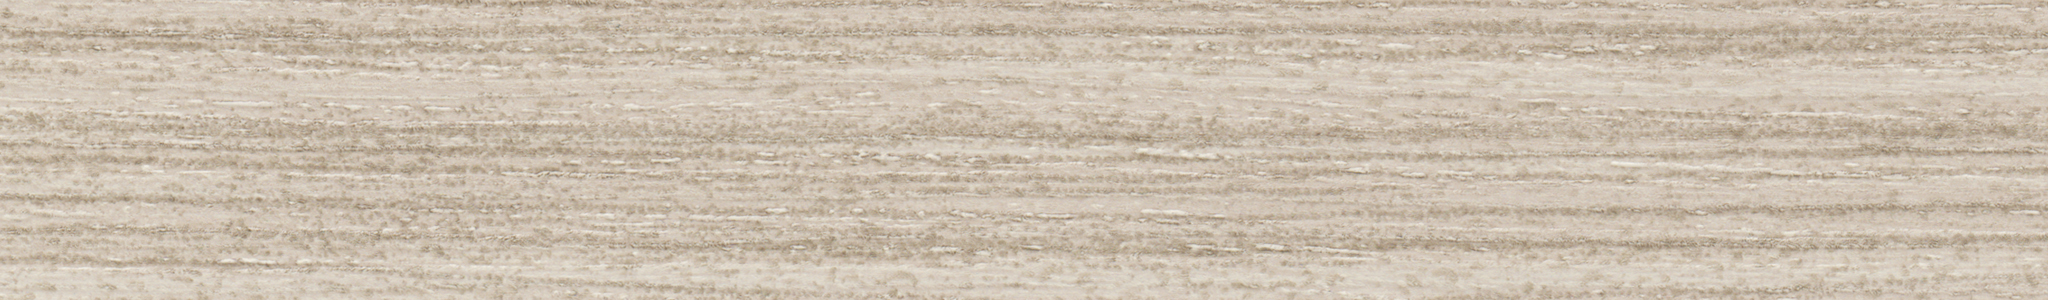 HD 293091 ABS hrana driftwood gravír